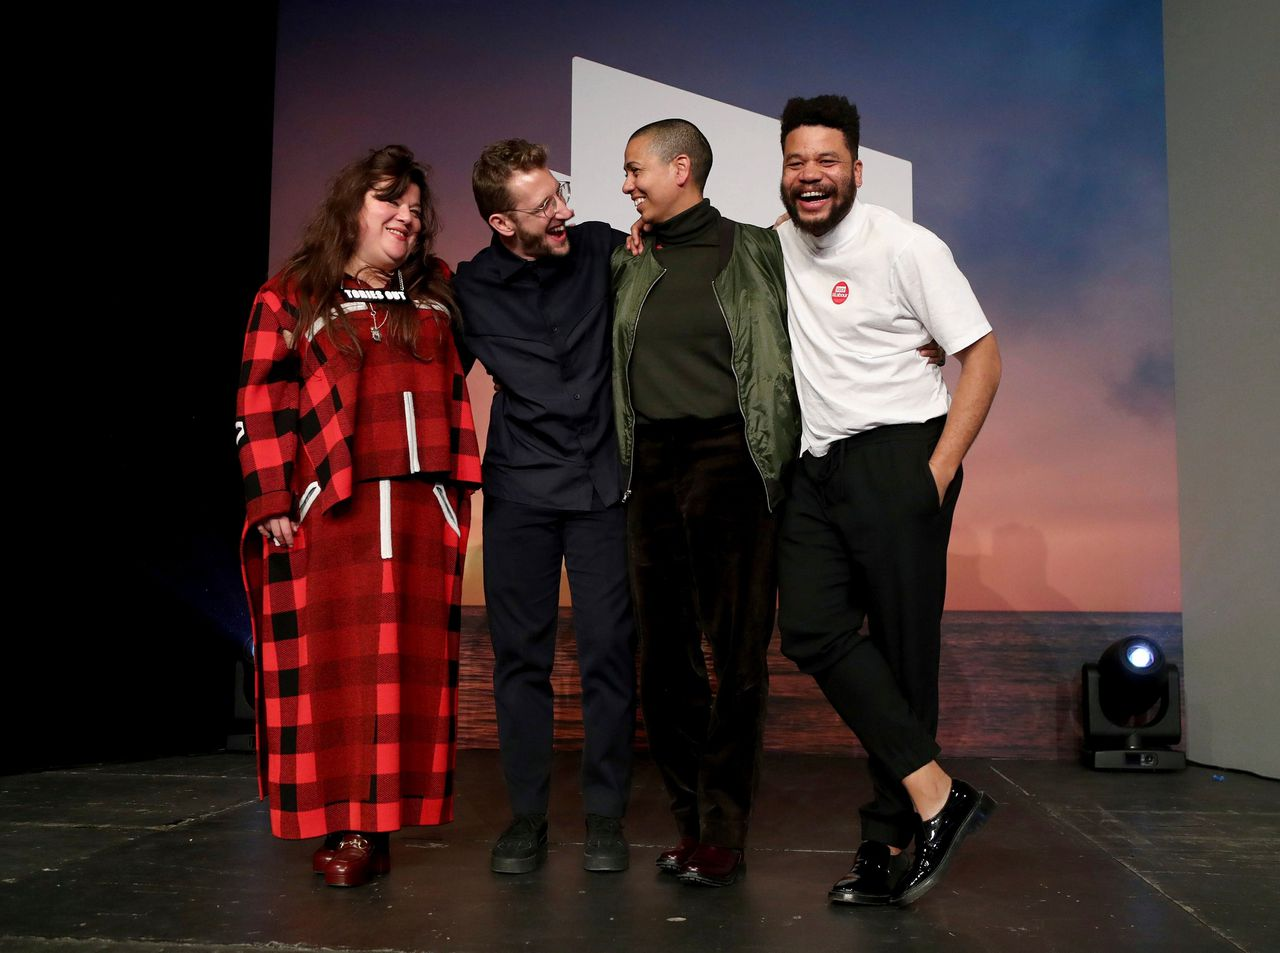 Tai Shani, Lawrence Abu Hamdan, Helen Cammock en Oscar Murillo nadat ze als collectief de Turnerprijs toegekend hebben gekregen